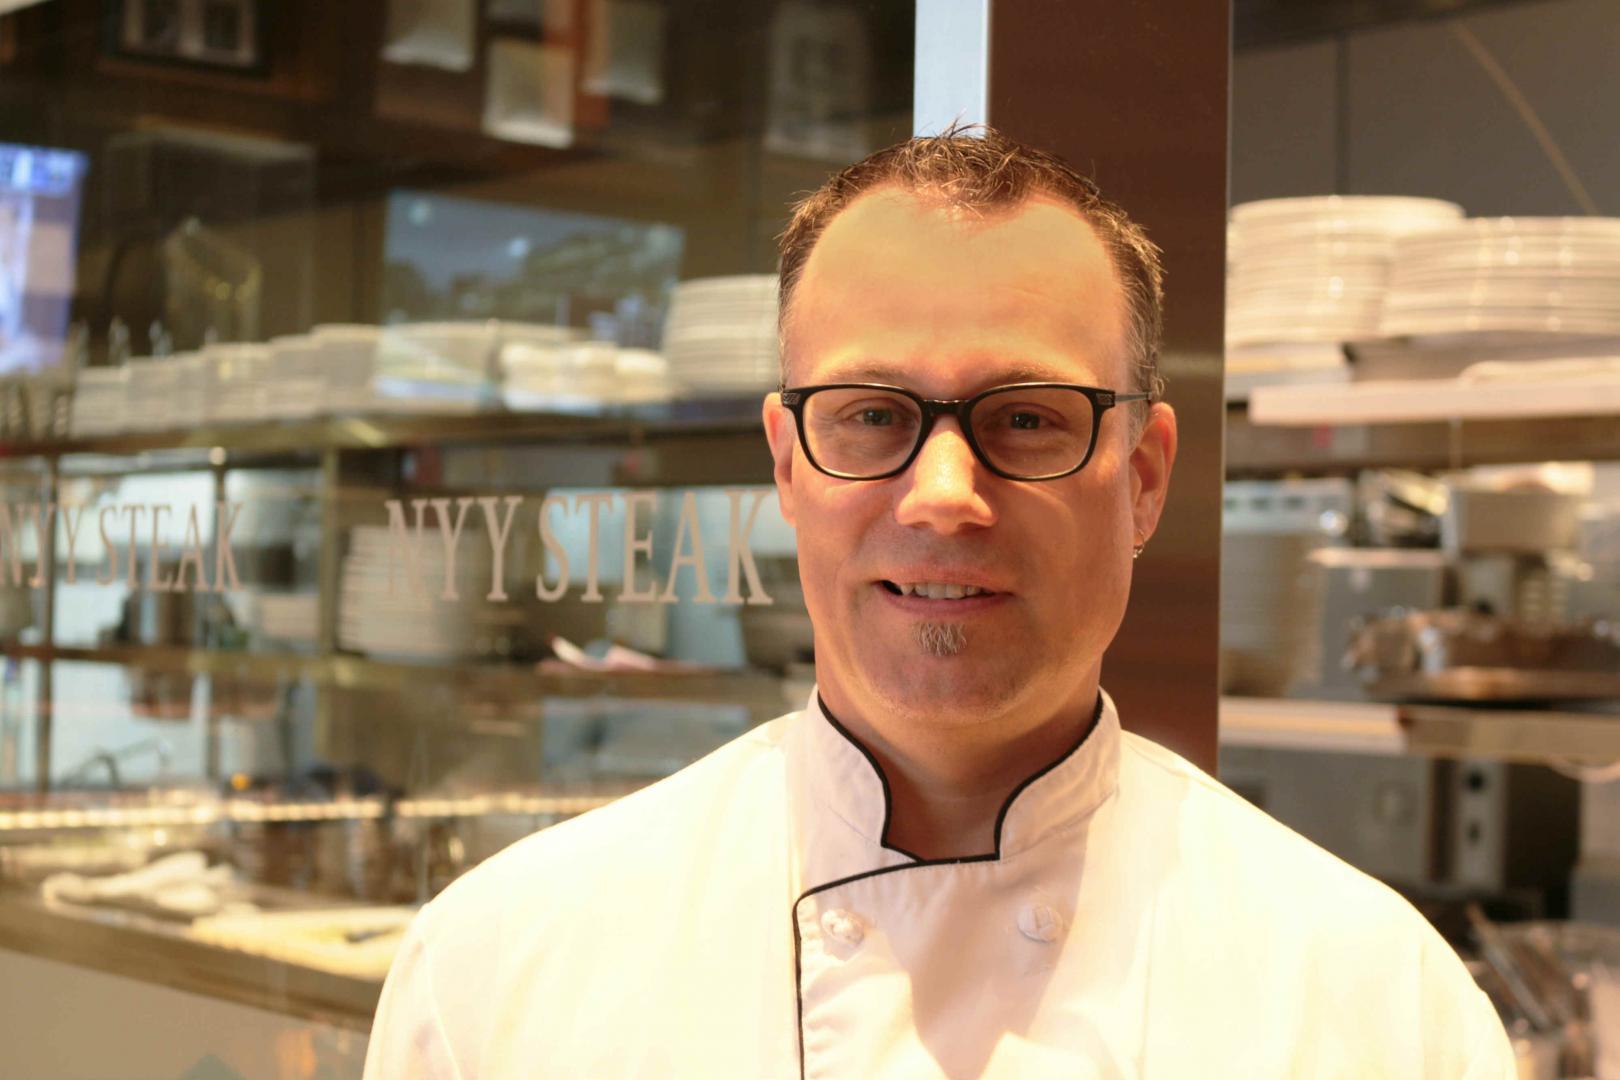 new-york-yankees-steakhouse-executive-chef-john-schafer-headshot